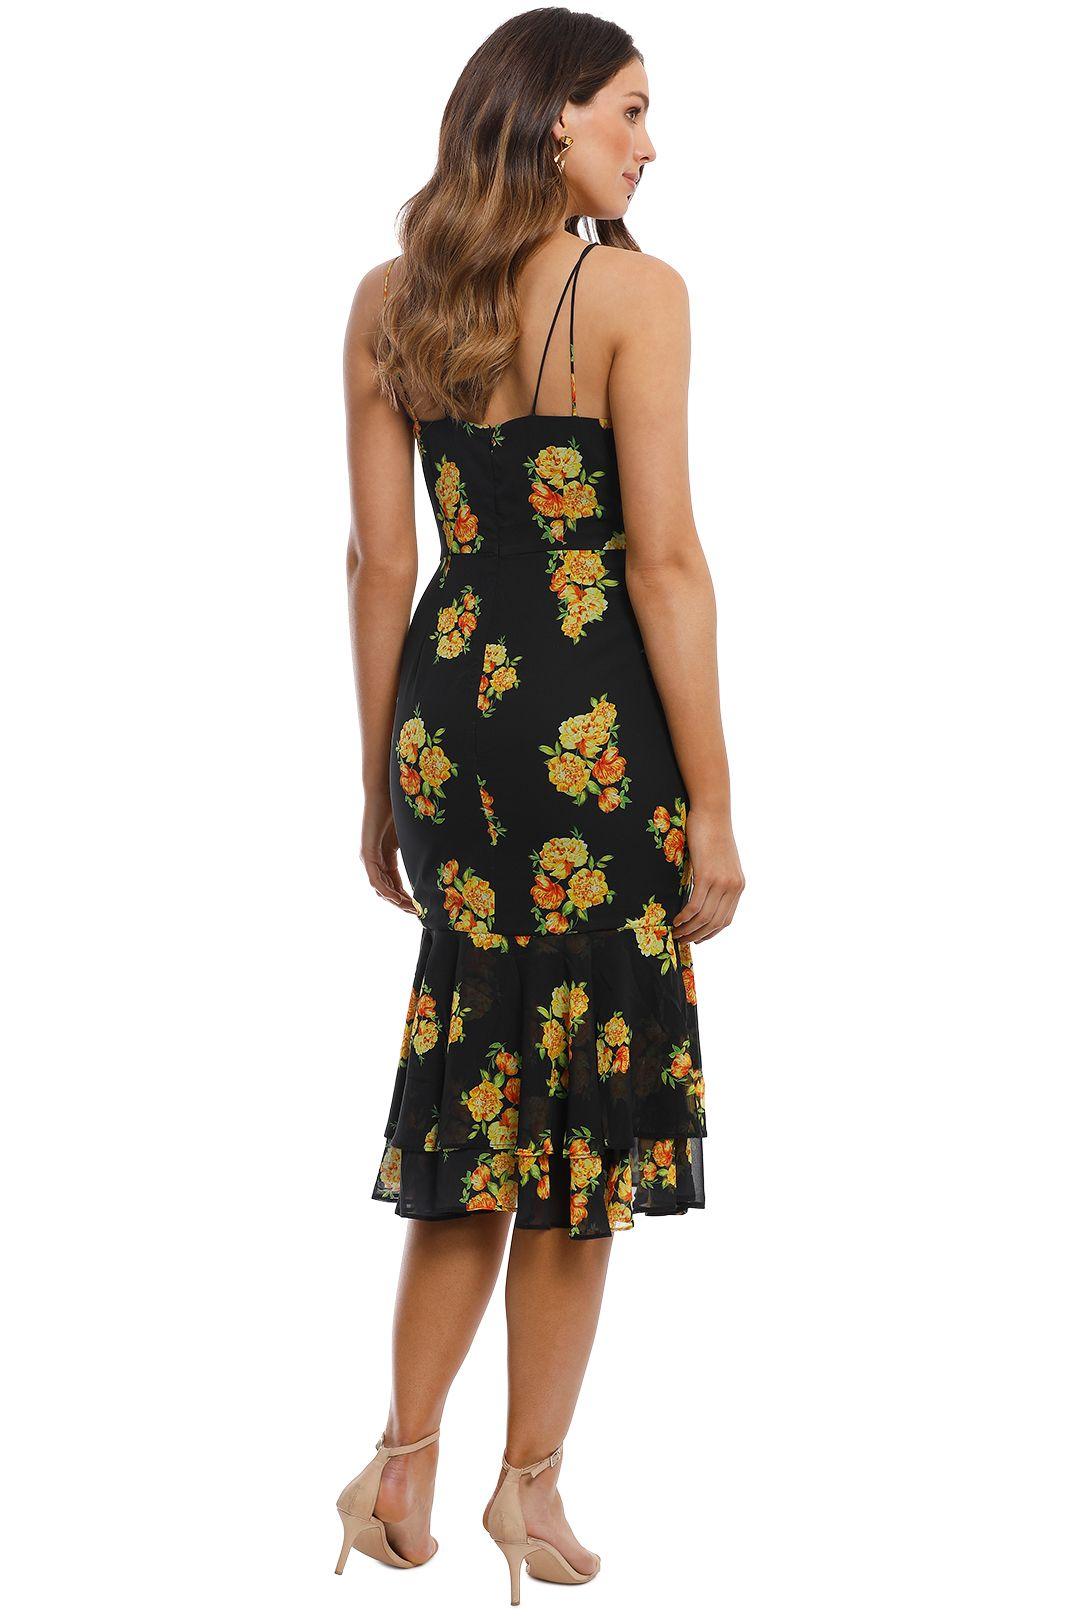 Cooper St - Cinnamon Midi Dress - Print Dark - Back